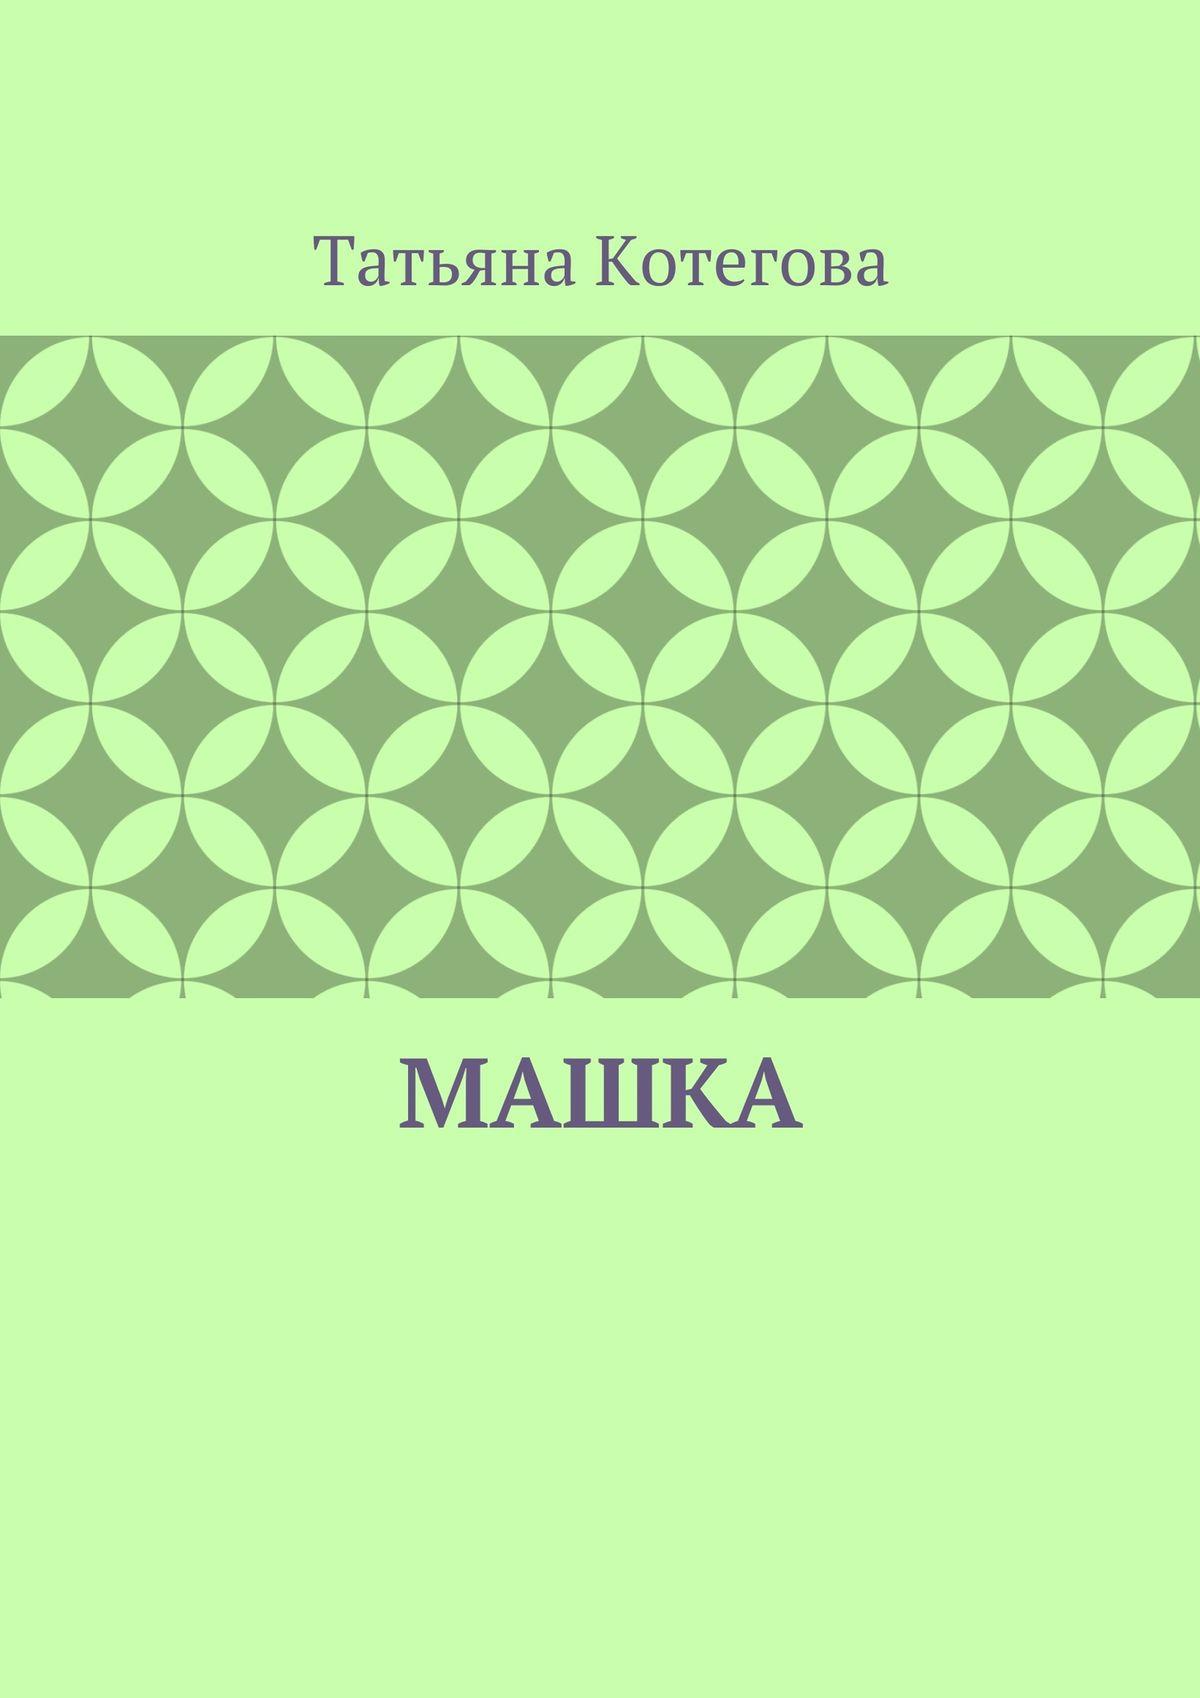 Татьяна Николаевна Котегова Машка татьяна котегова машка